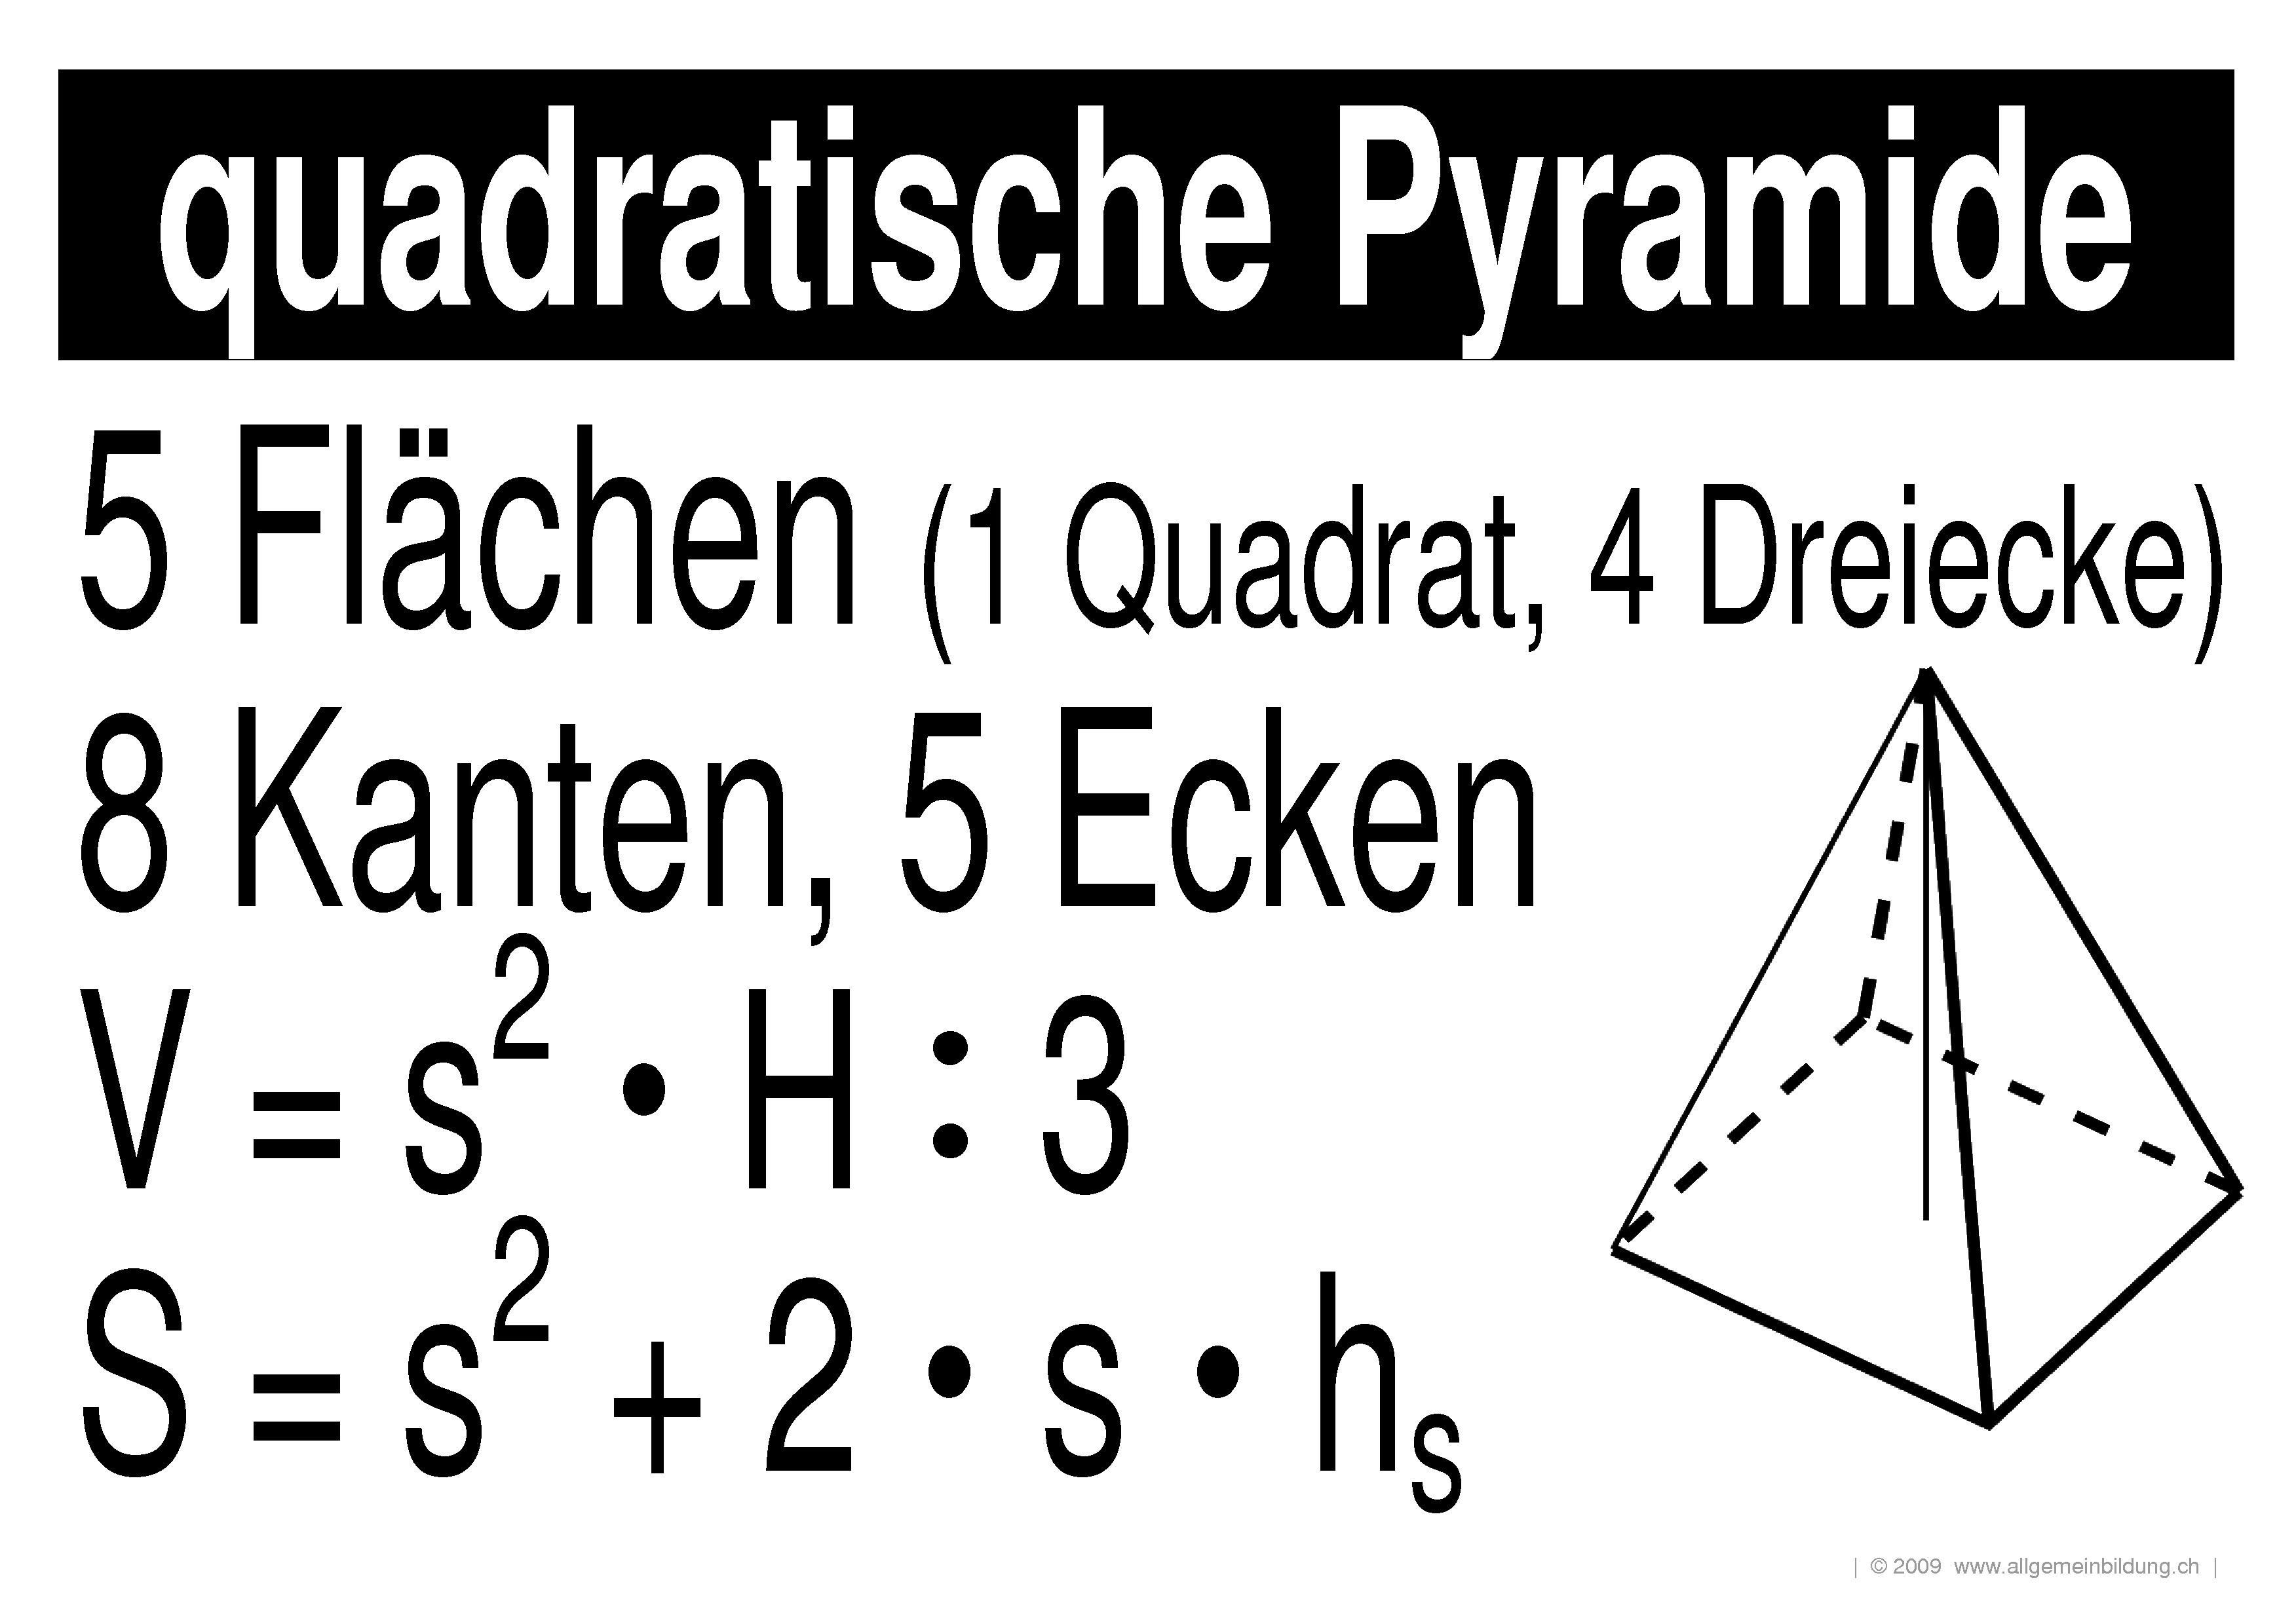 mathematik geometrie lernplakate wissensposter quadratische pyramide 8500 bungen. Black Bedroom Furniture Sets. Home Design Ideas